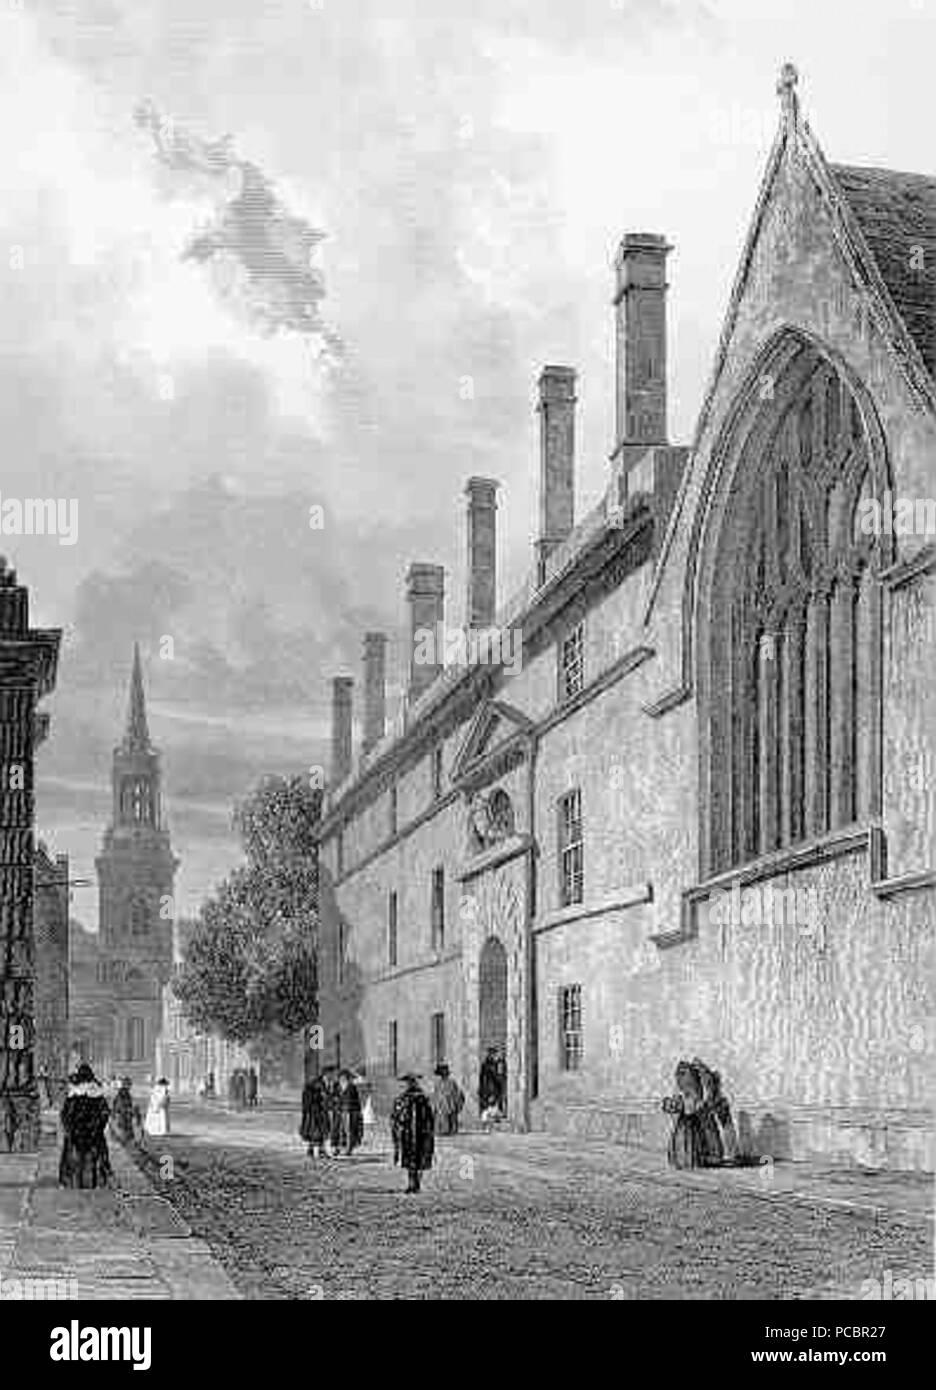 27 Jesus College engraving 1839 - Stock Image